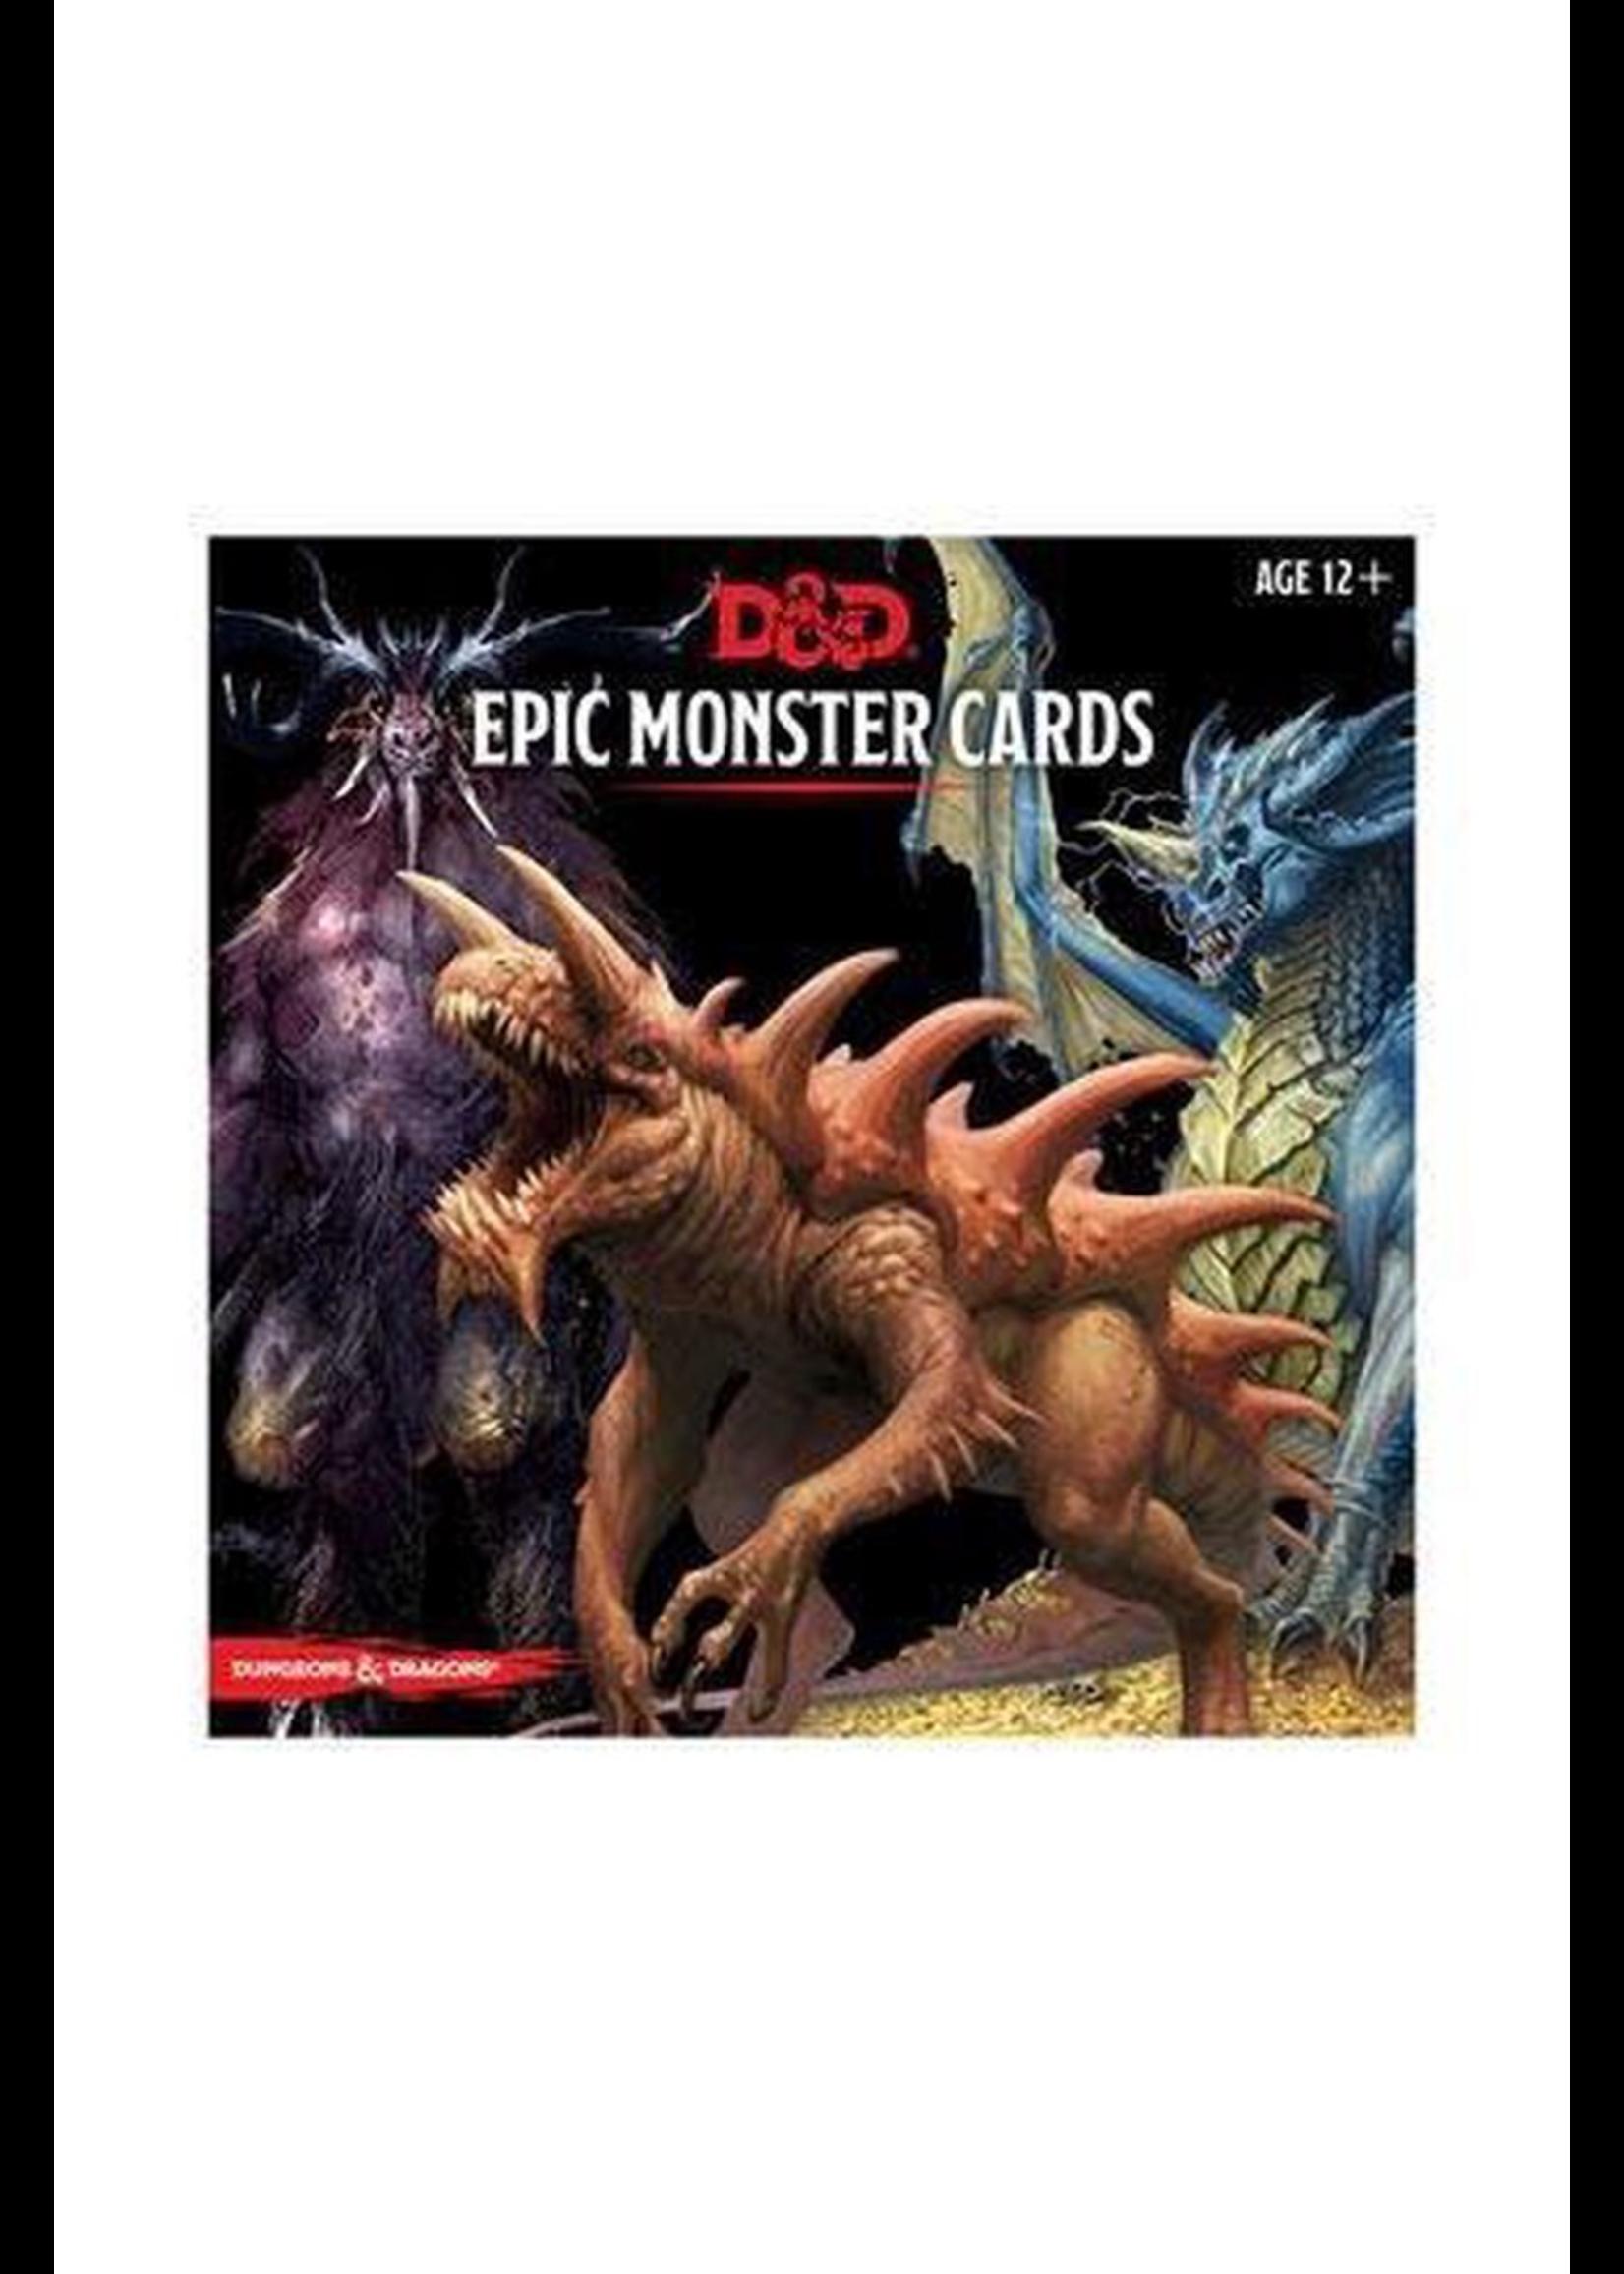 D&D Monster Cards - Epic Monster Cards